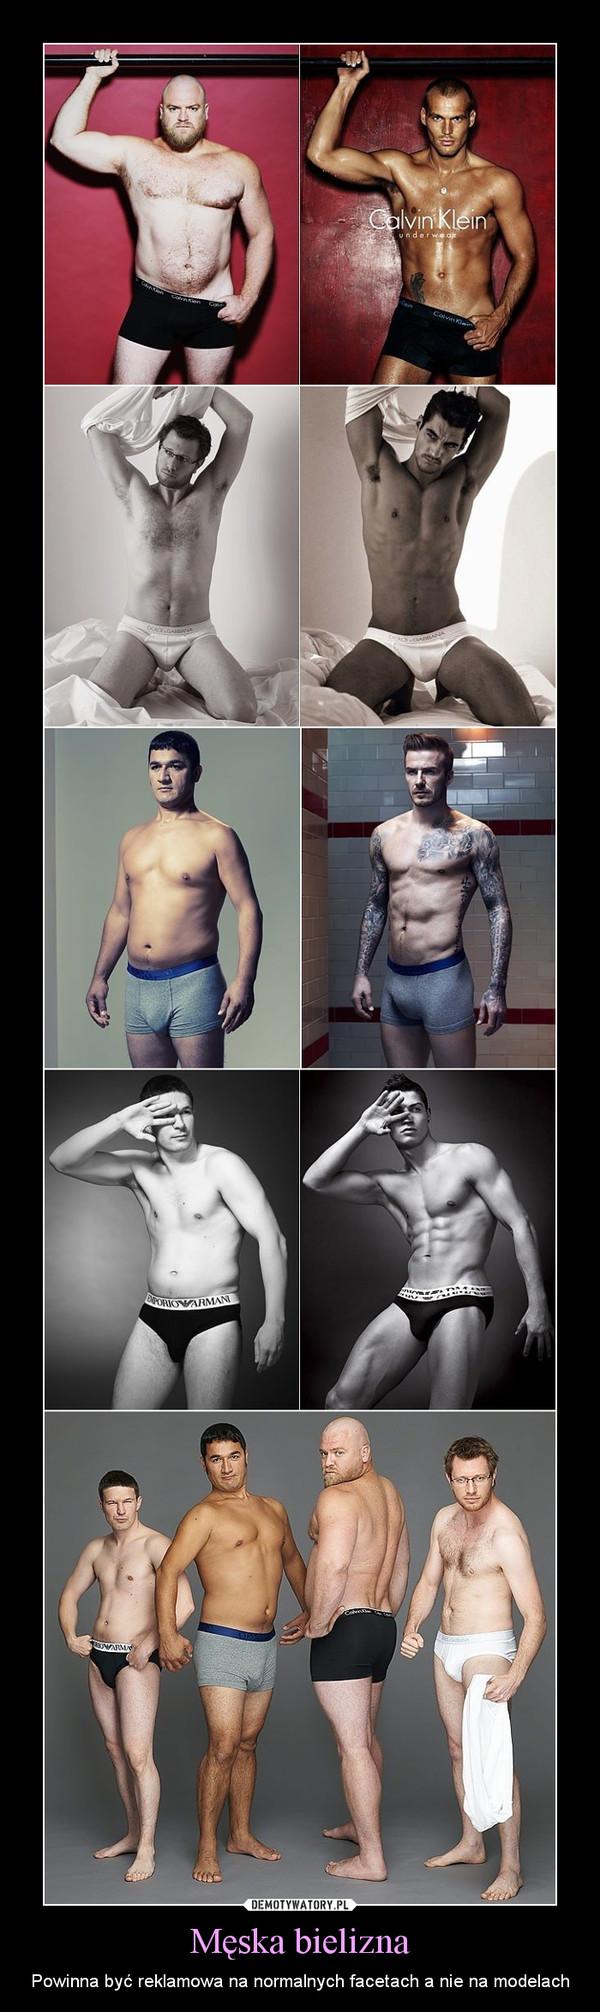 Męska bielizna – Powinna być reklamowa na normalnych facetach a nie na modelach